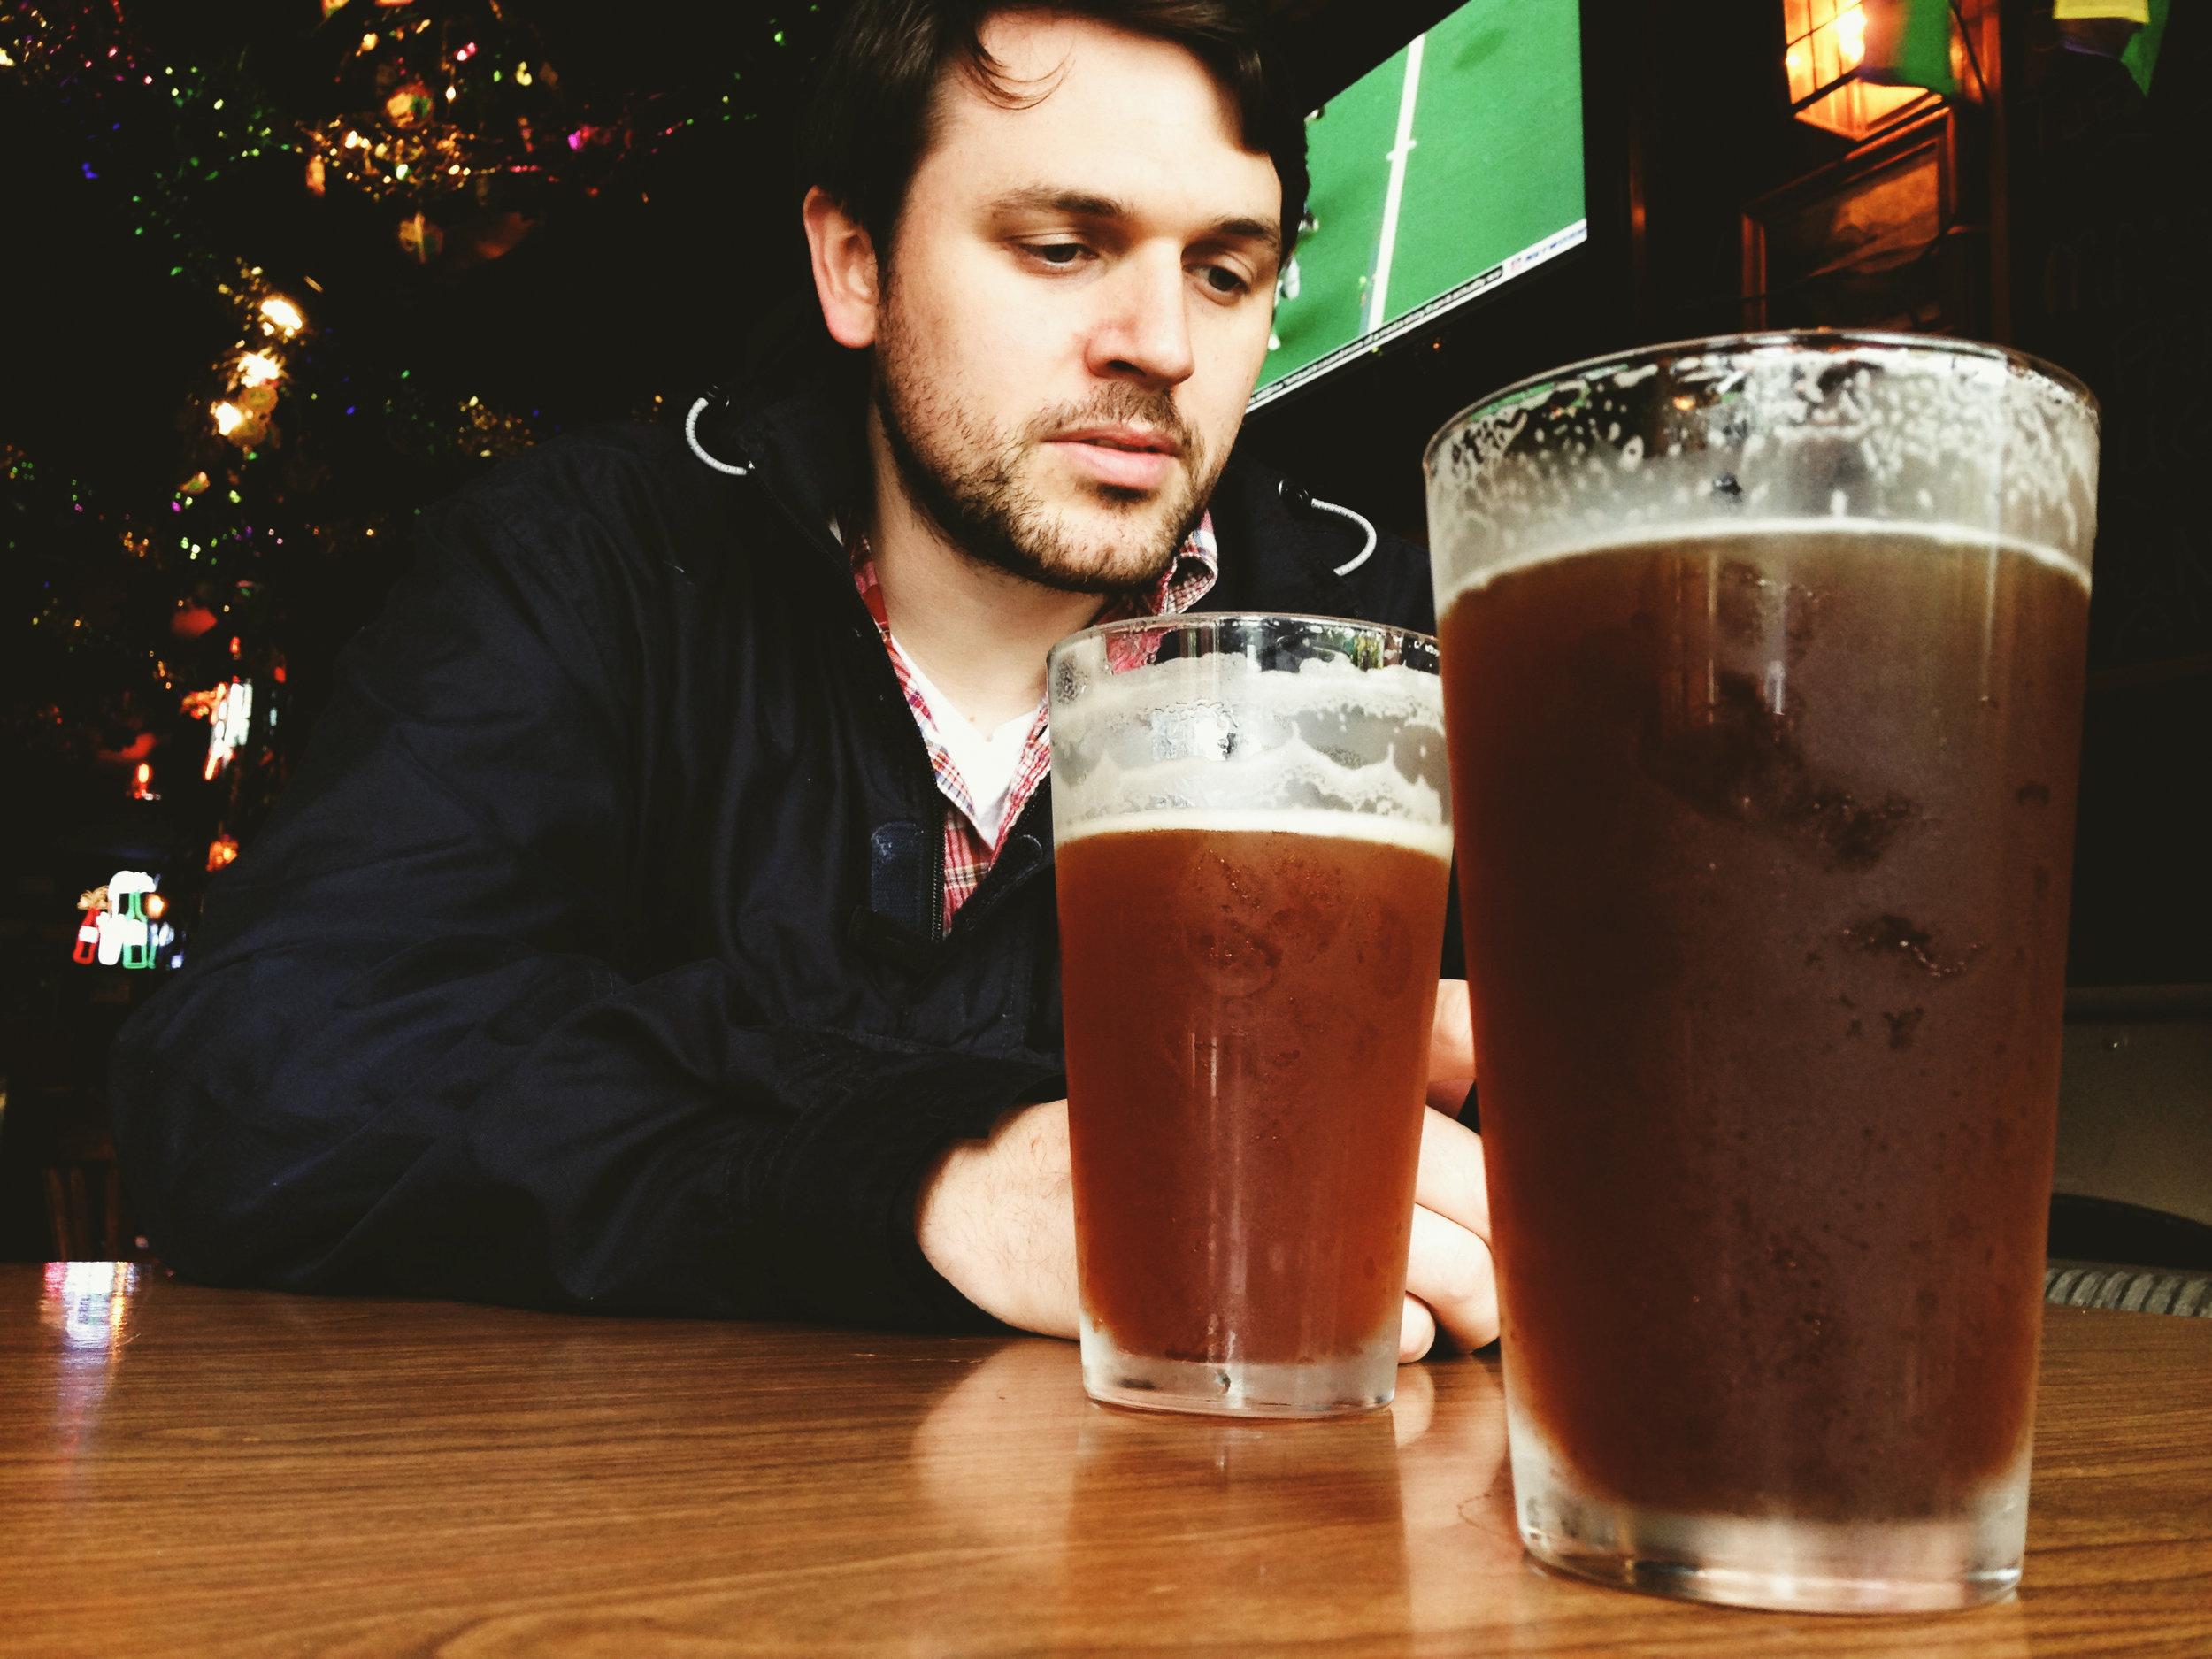 Beer in Haines, Alaska Travel Blog   MALLORIE OWENS